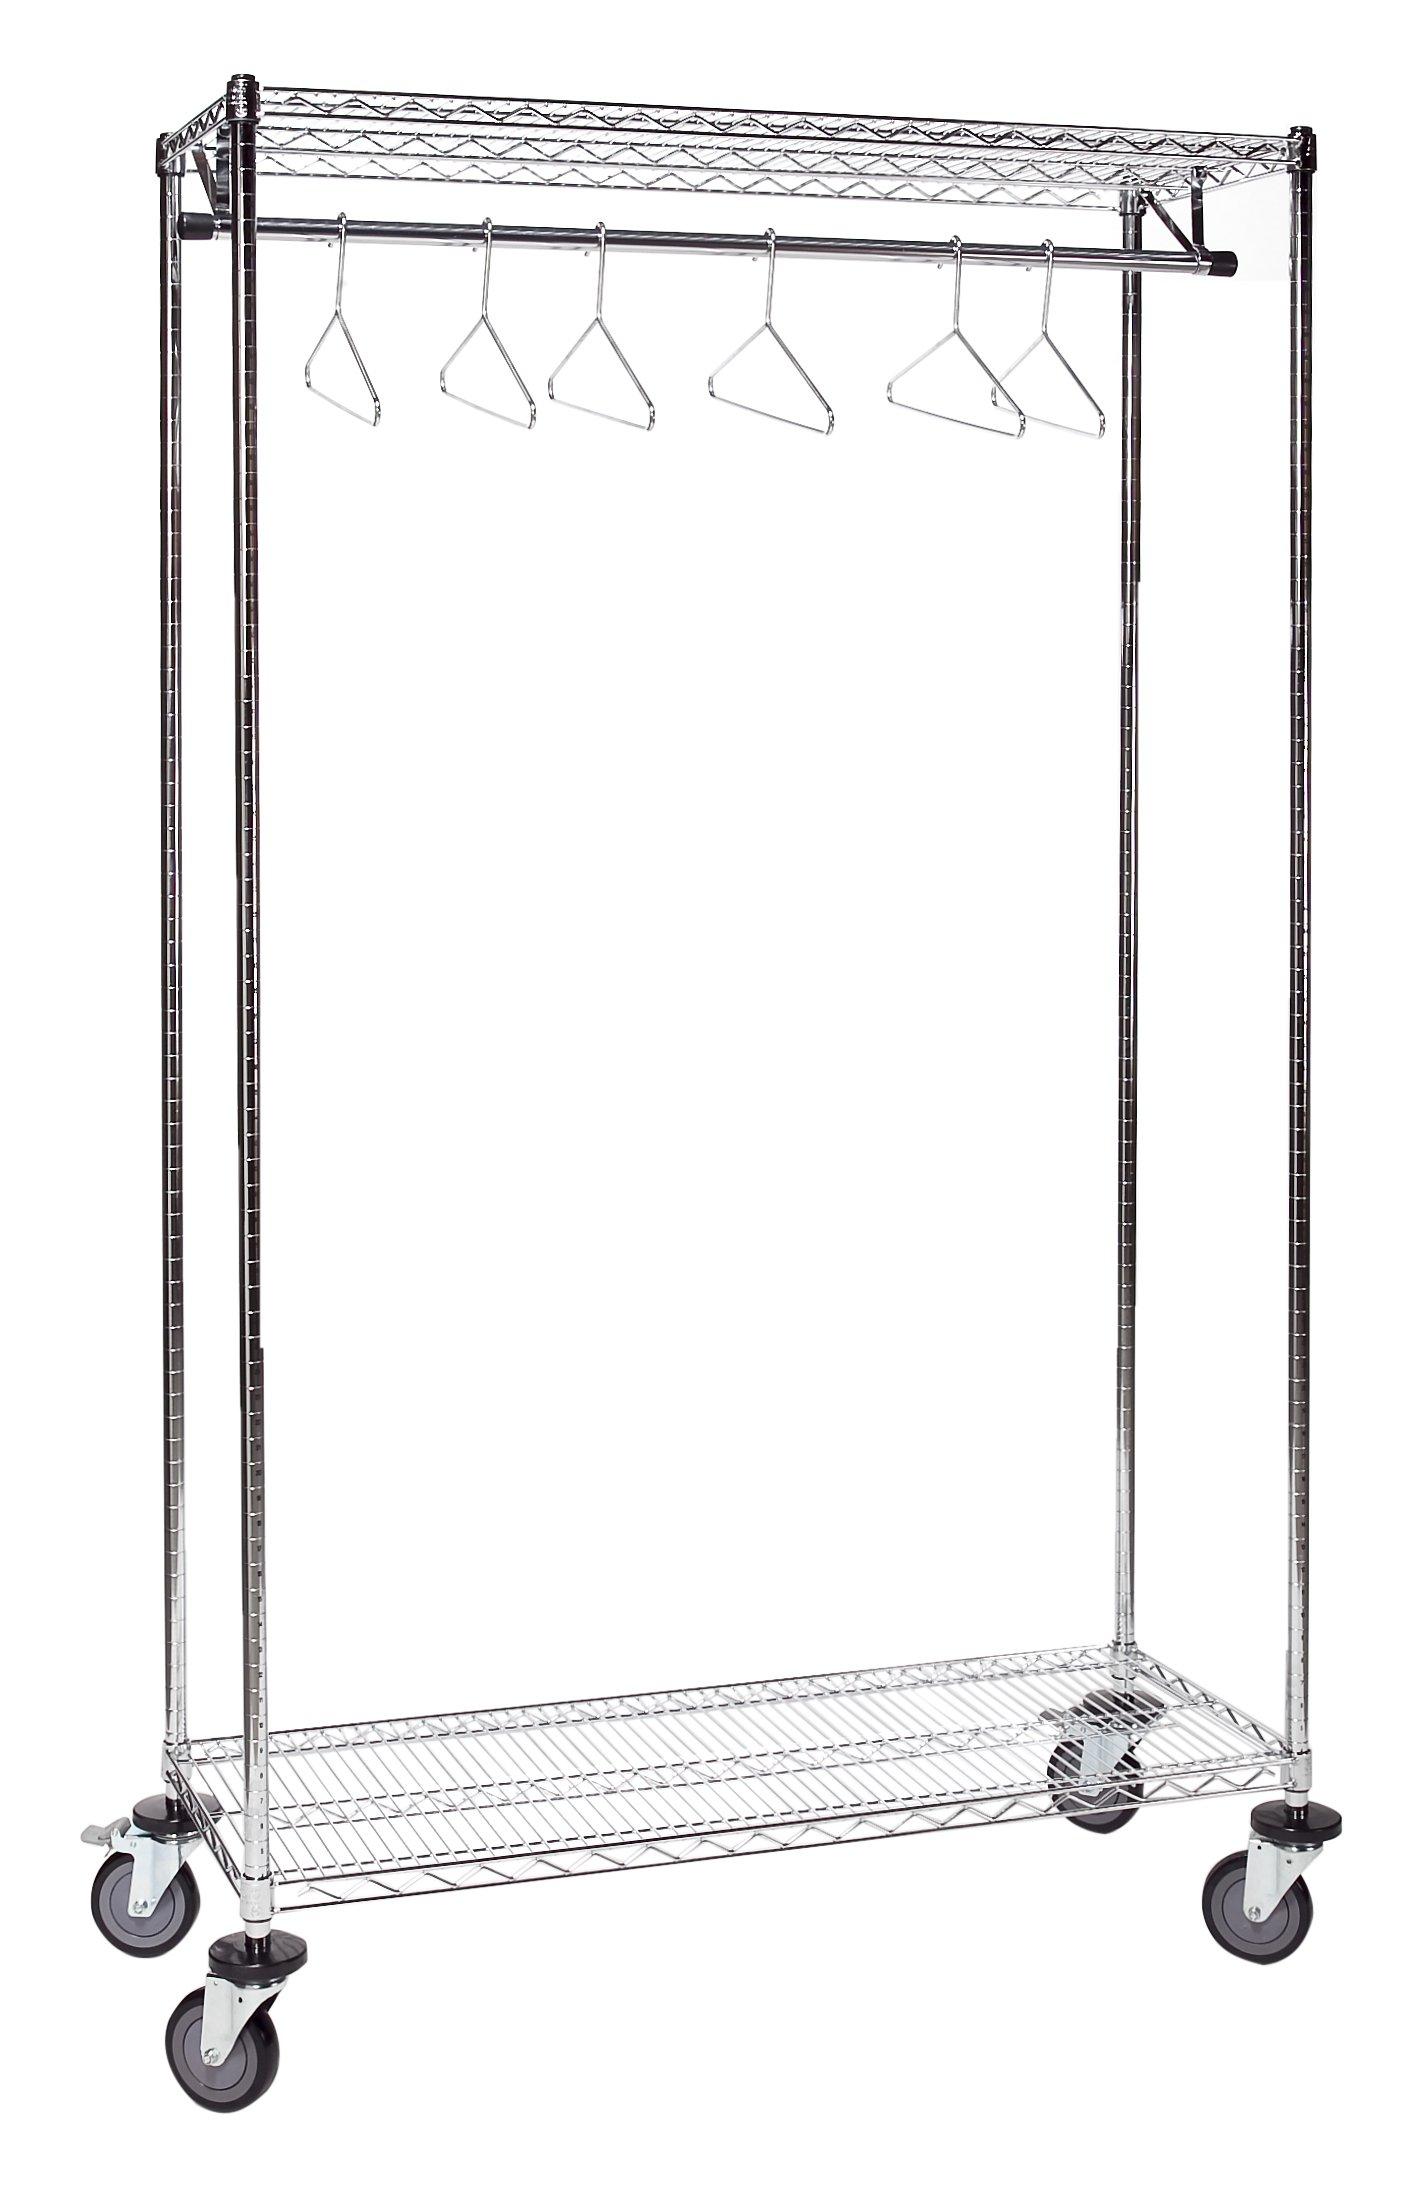 Tarrison GS1836C Chrome Garment Storage Rack, 36'' Length x 74'' Height x 18'' Depth